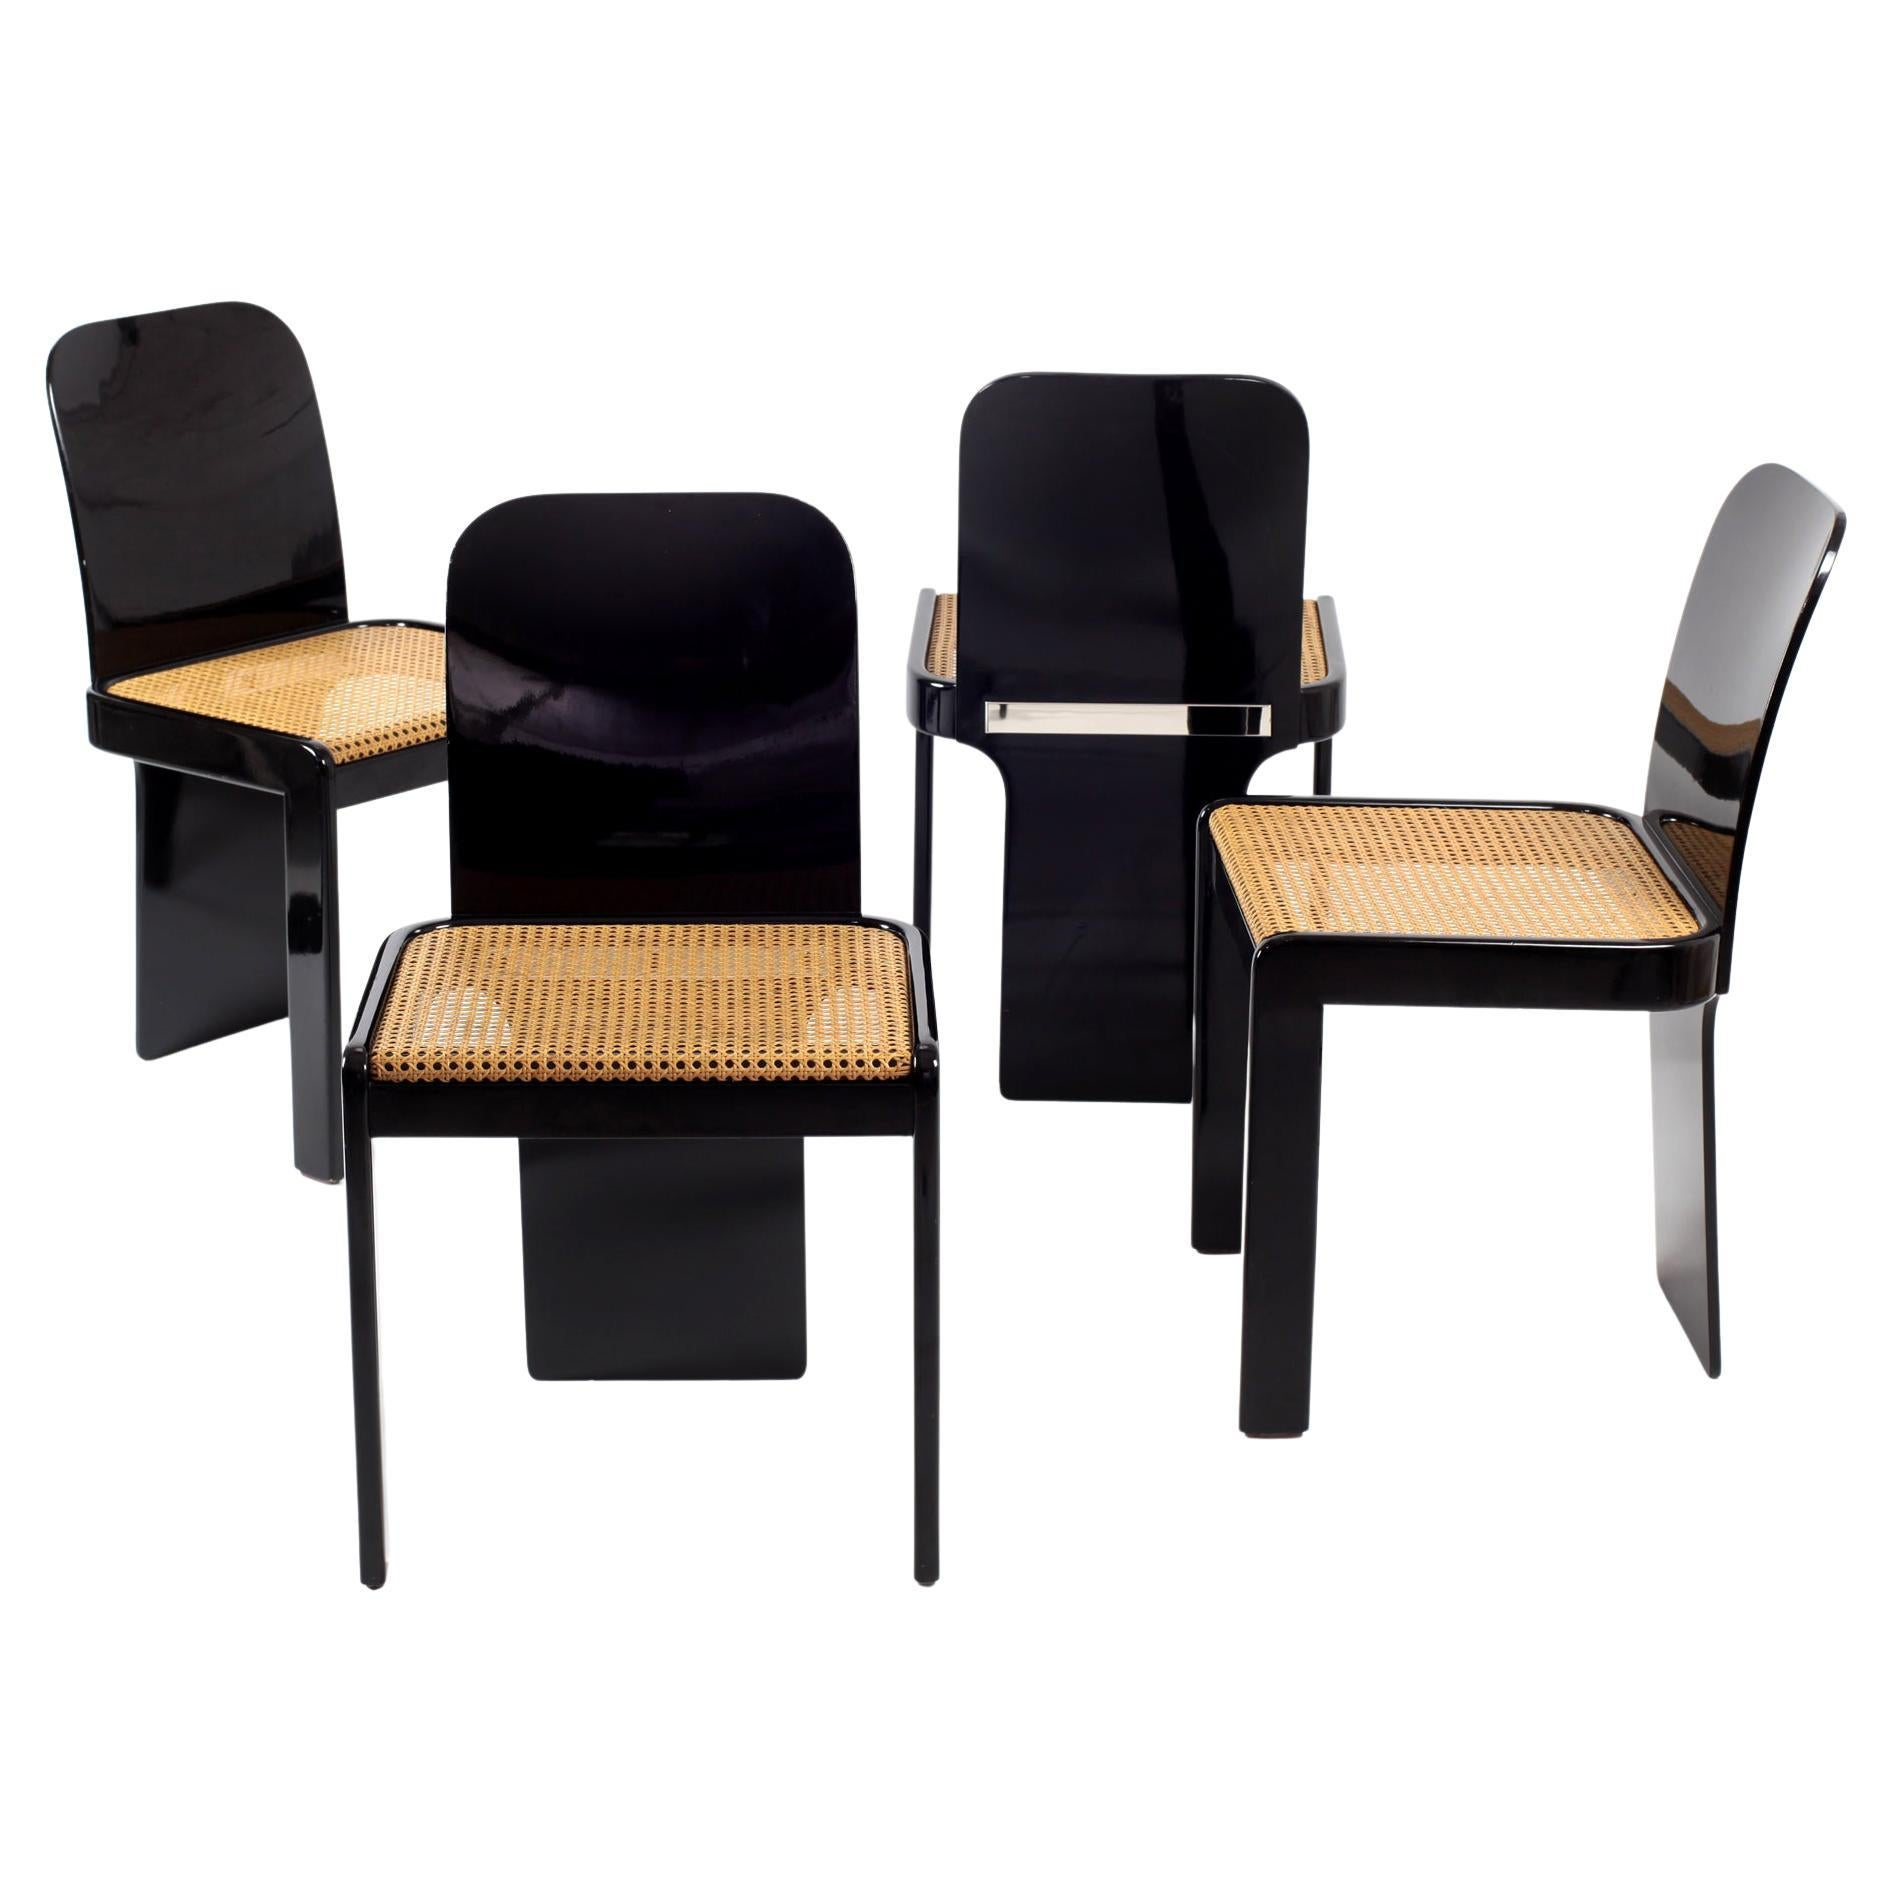 Set of 4 Chairs by Pierluigi Molinari for Pozzi Mid-Century Modern Italian 1970s